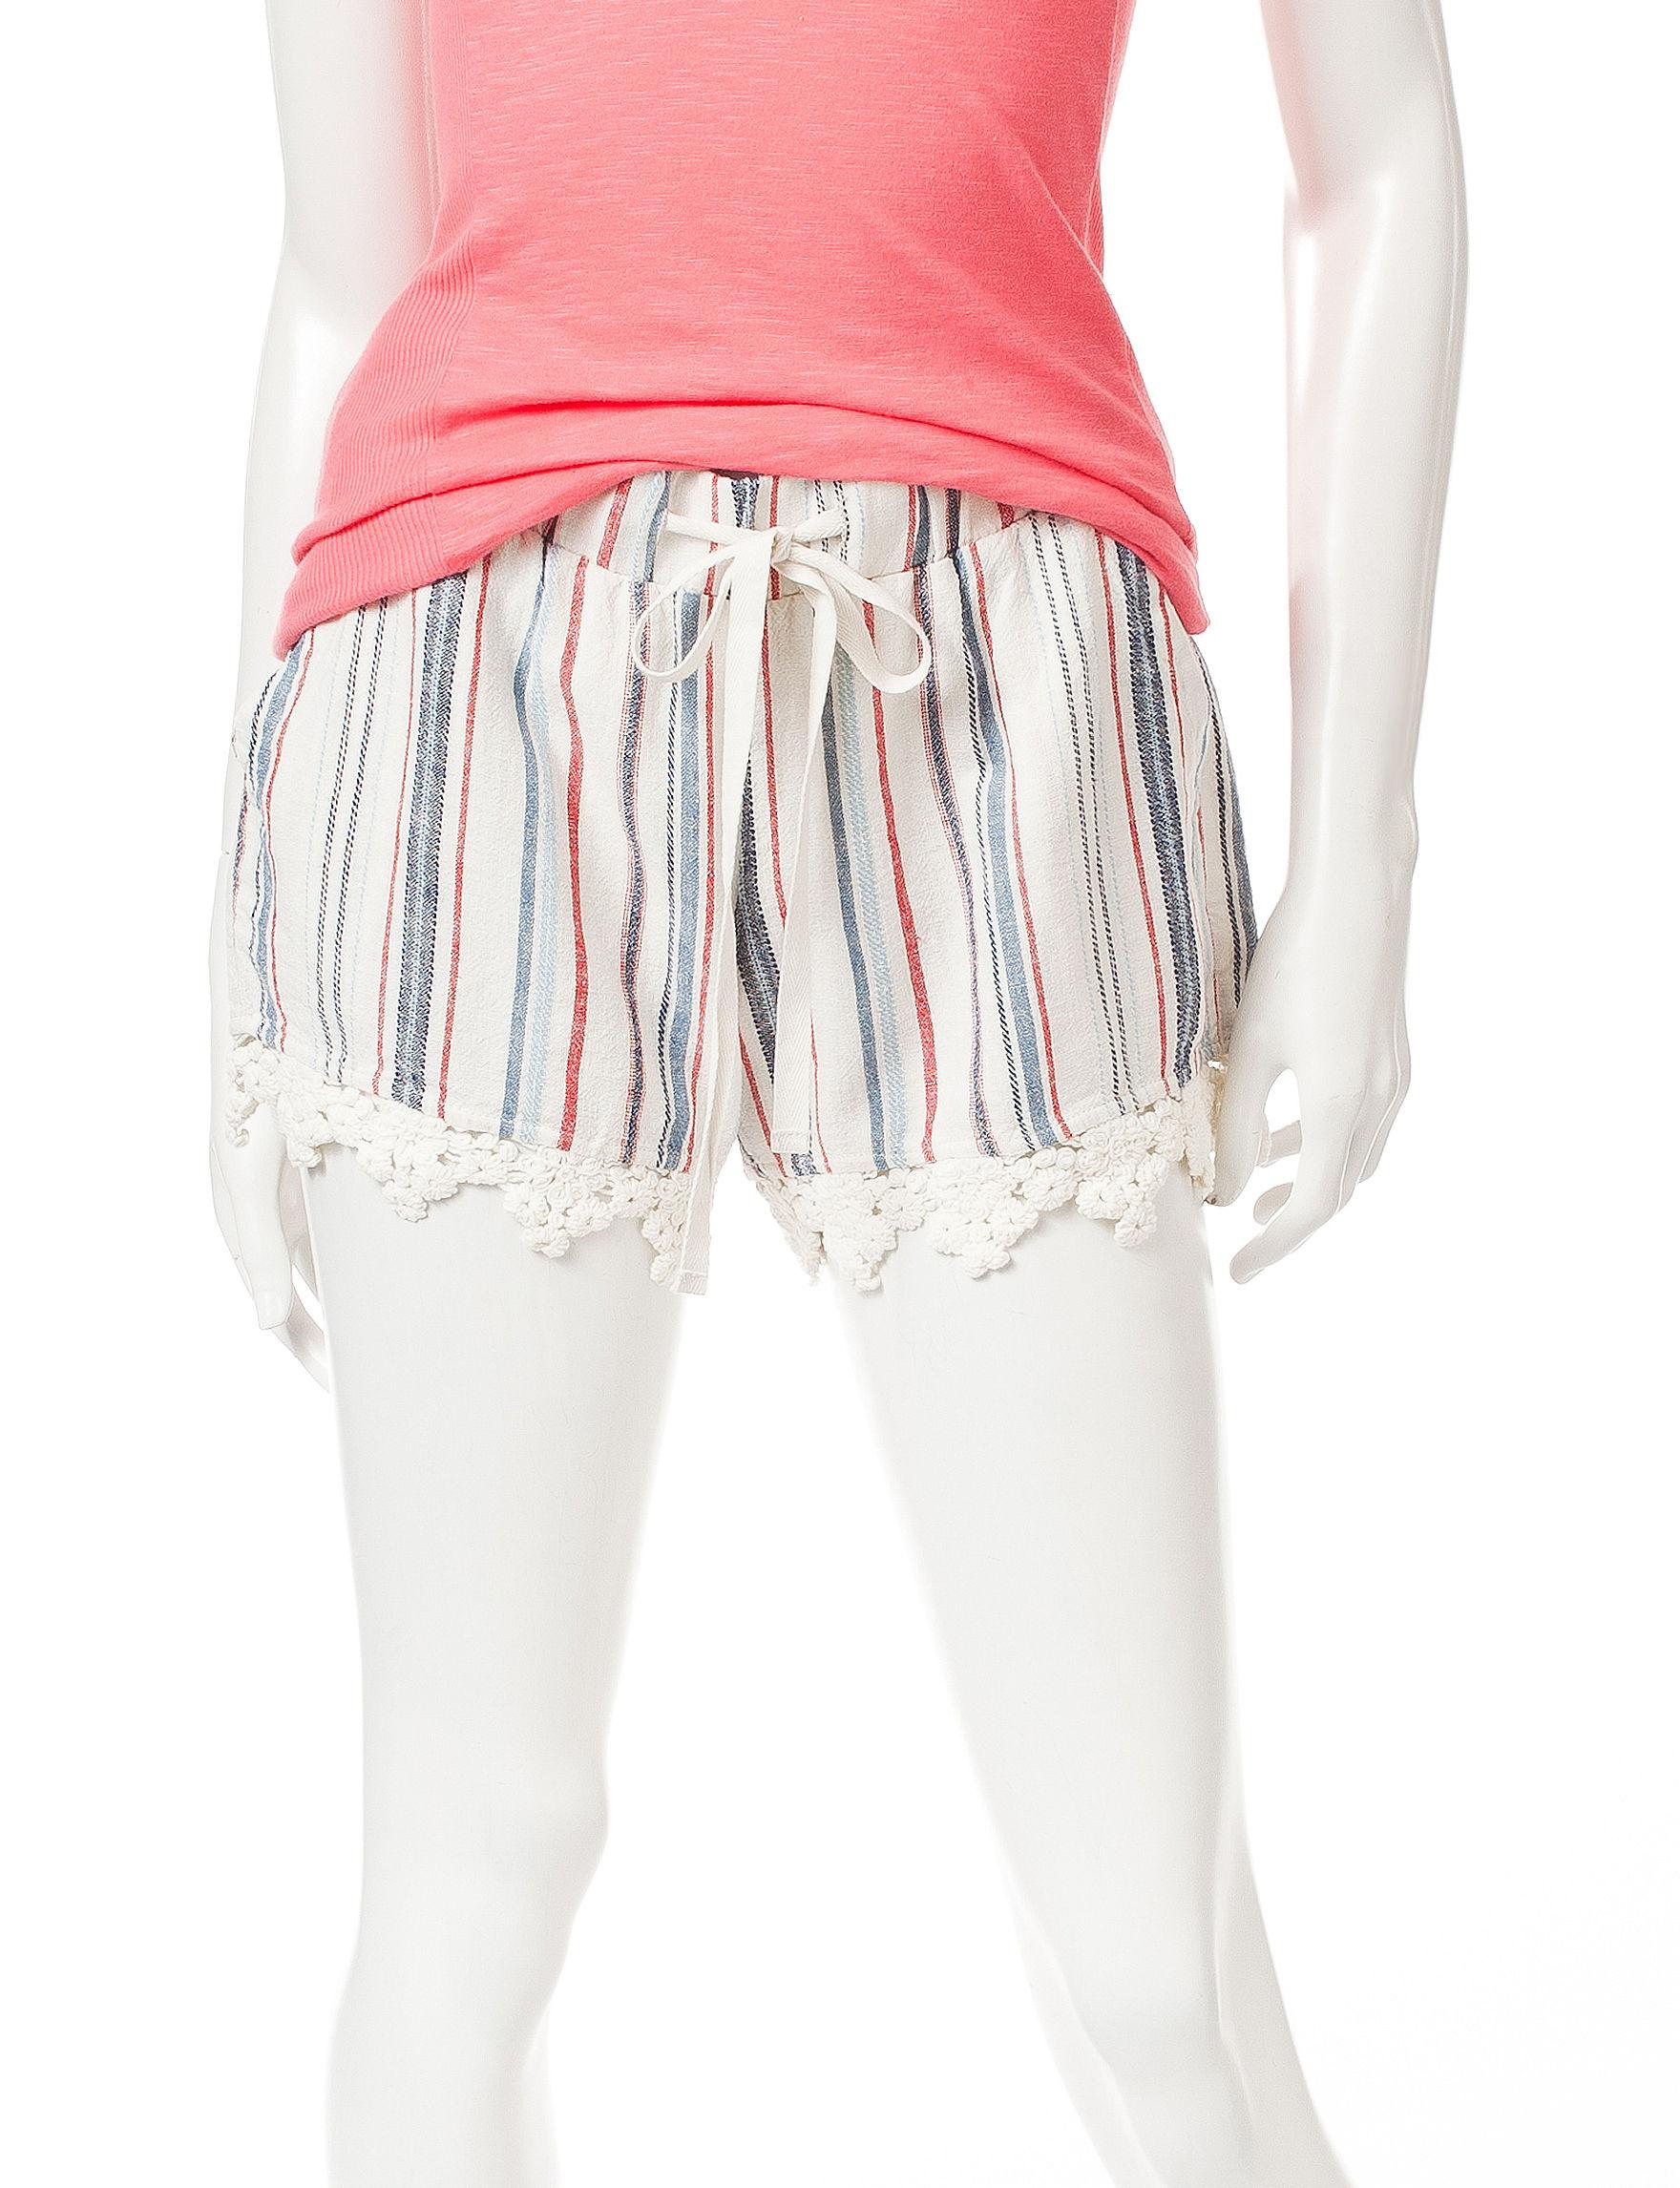 BeBop Cream / Navy Soft Shorts